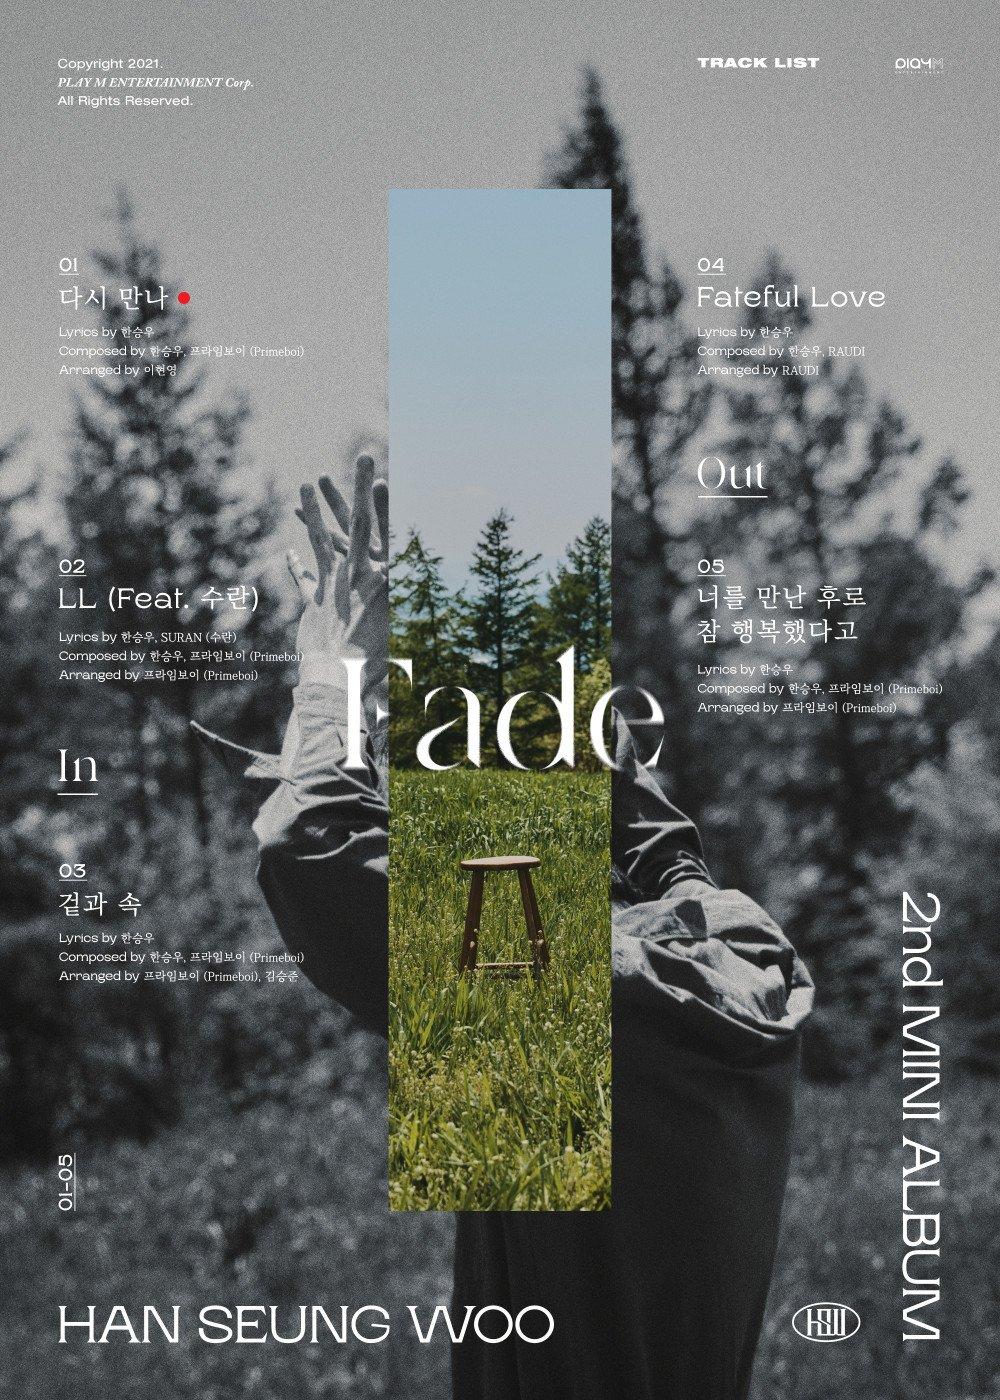 Seungwoo de VICTON participa como compositor y letrista para Fade